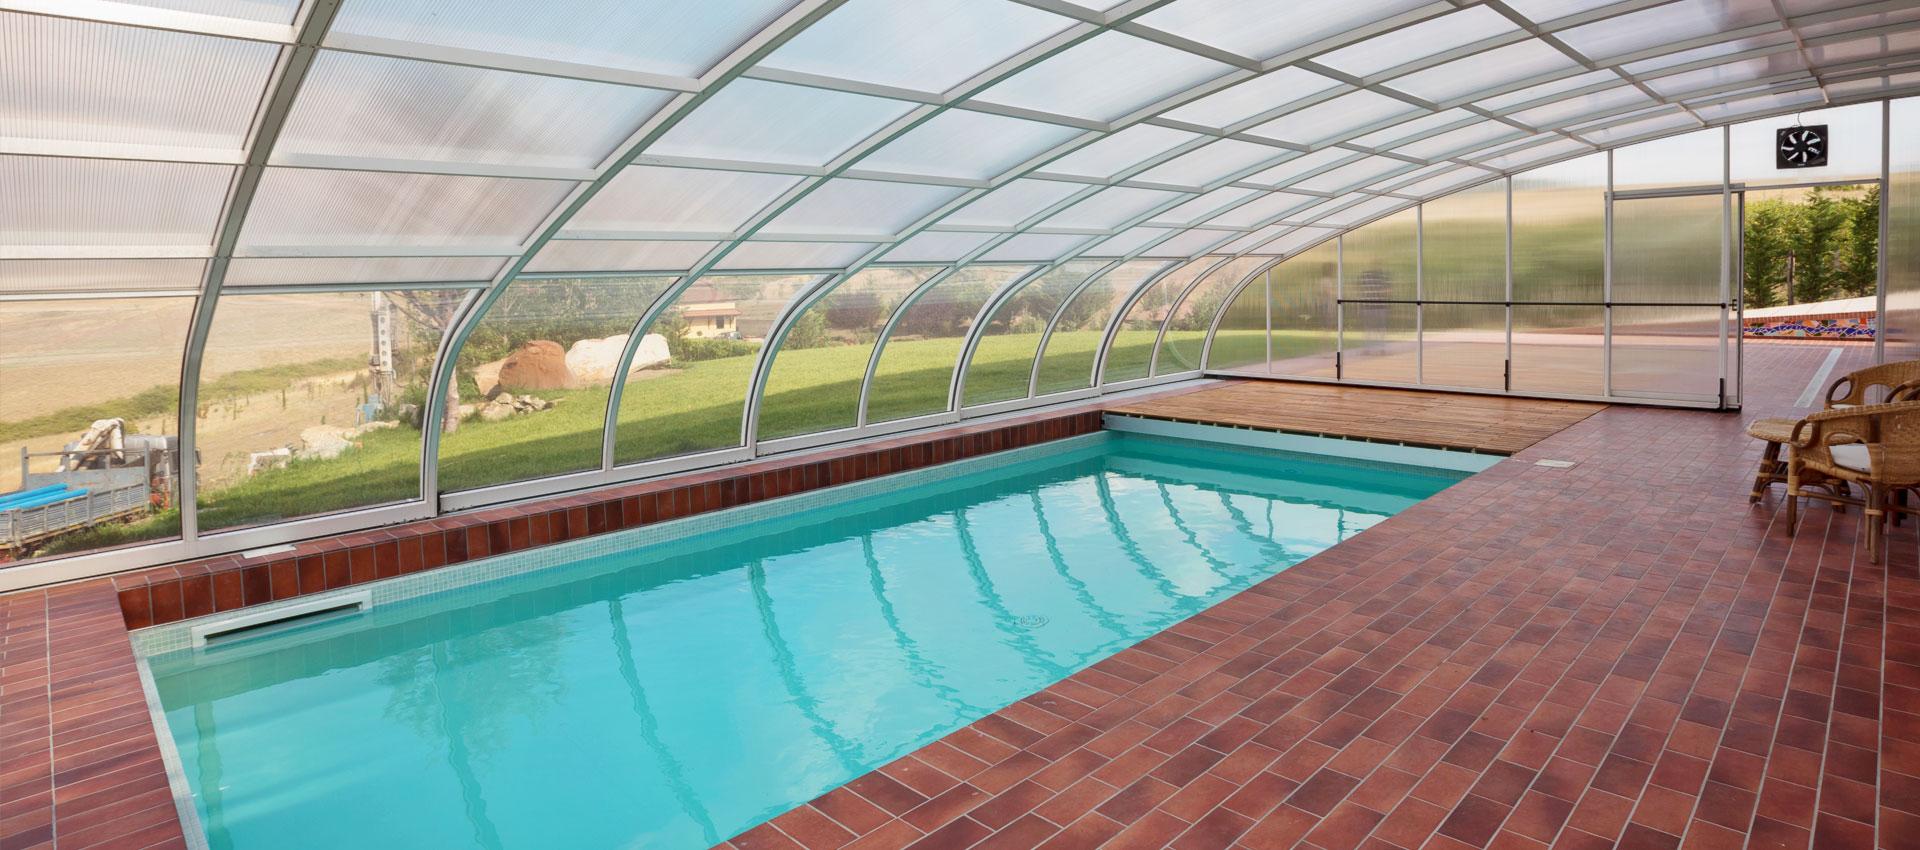 Acqua Azzurra Piscine coperture per piscine per proteggere l'acqua ~ piscine